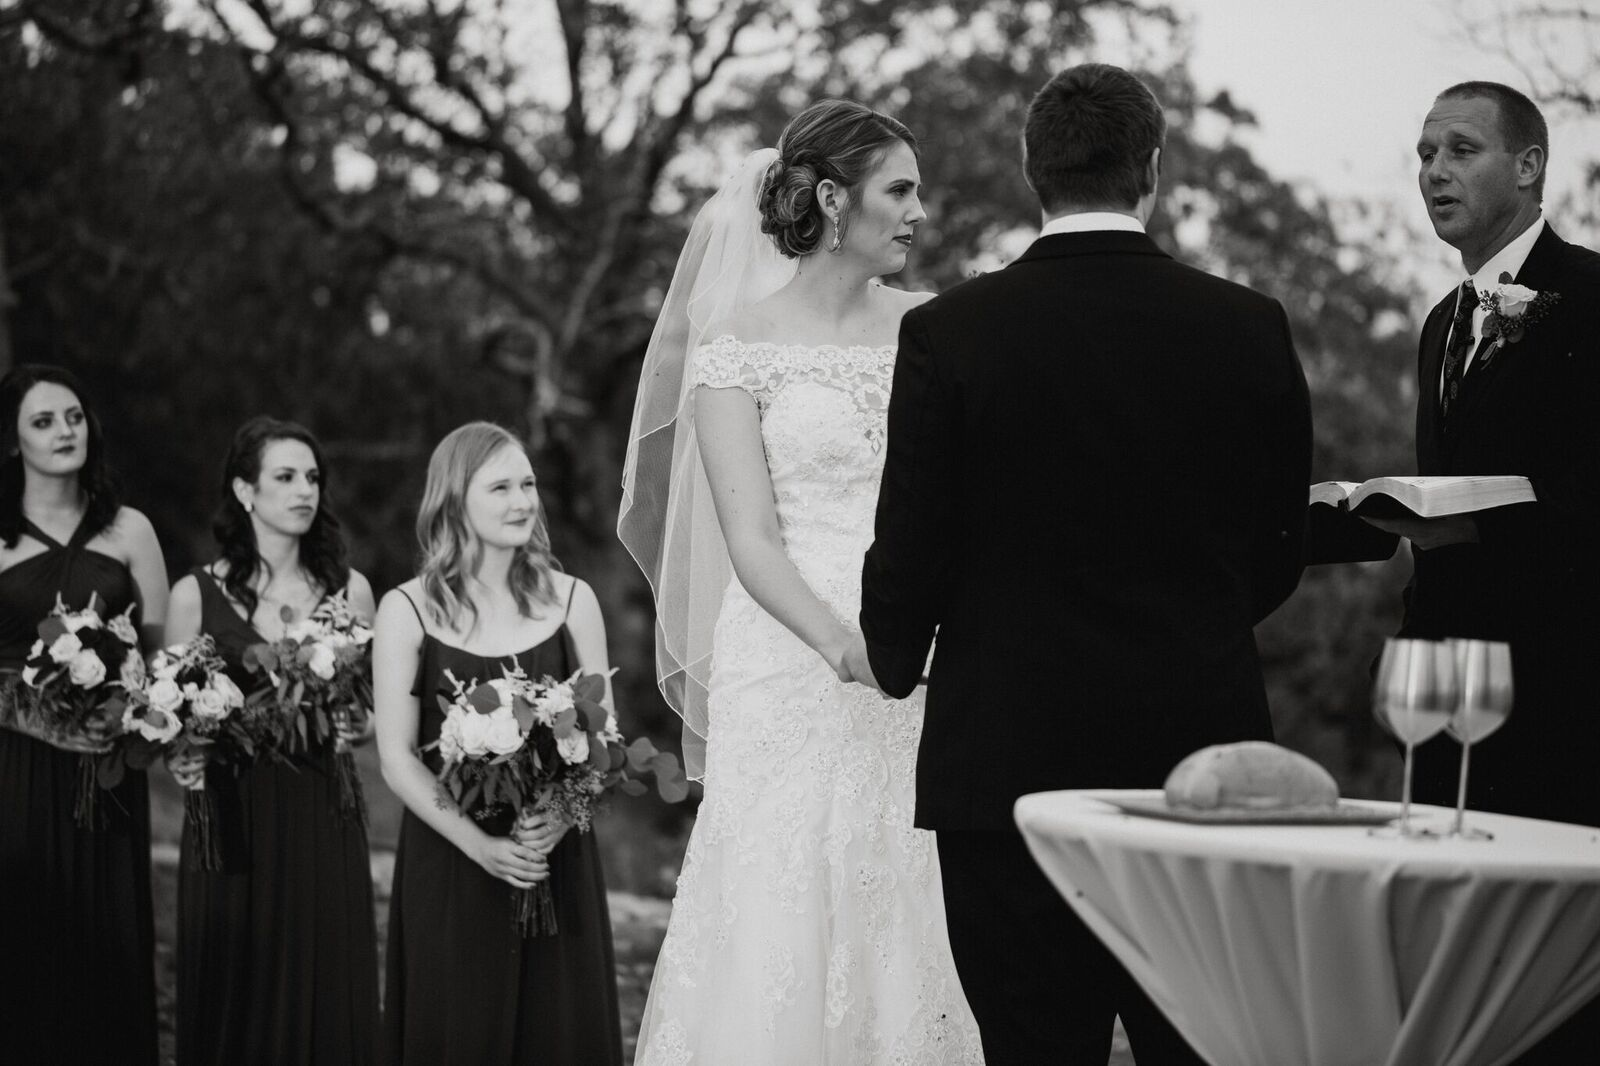 Tulsa Wedding Venue White Barn 17a.jpg